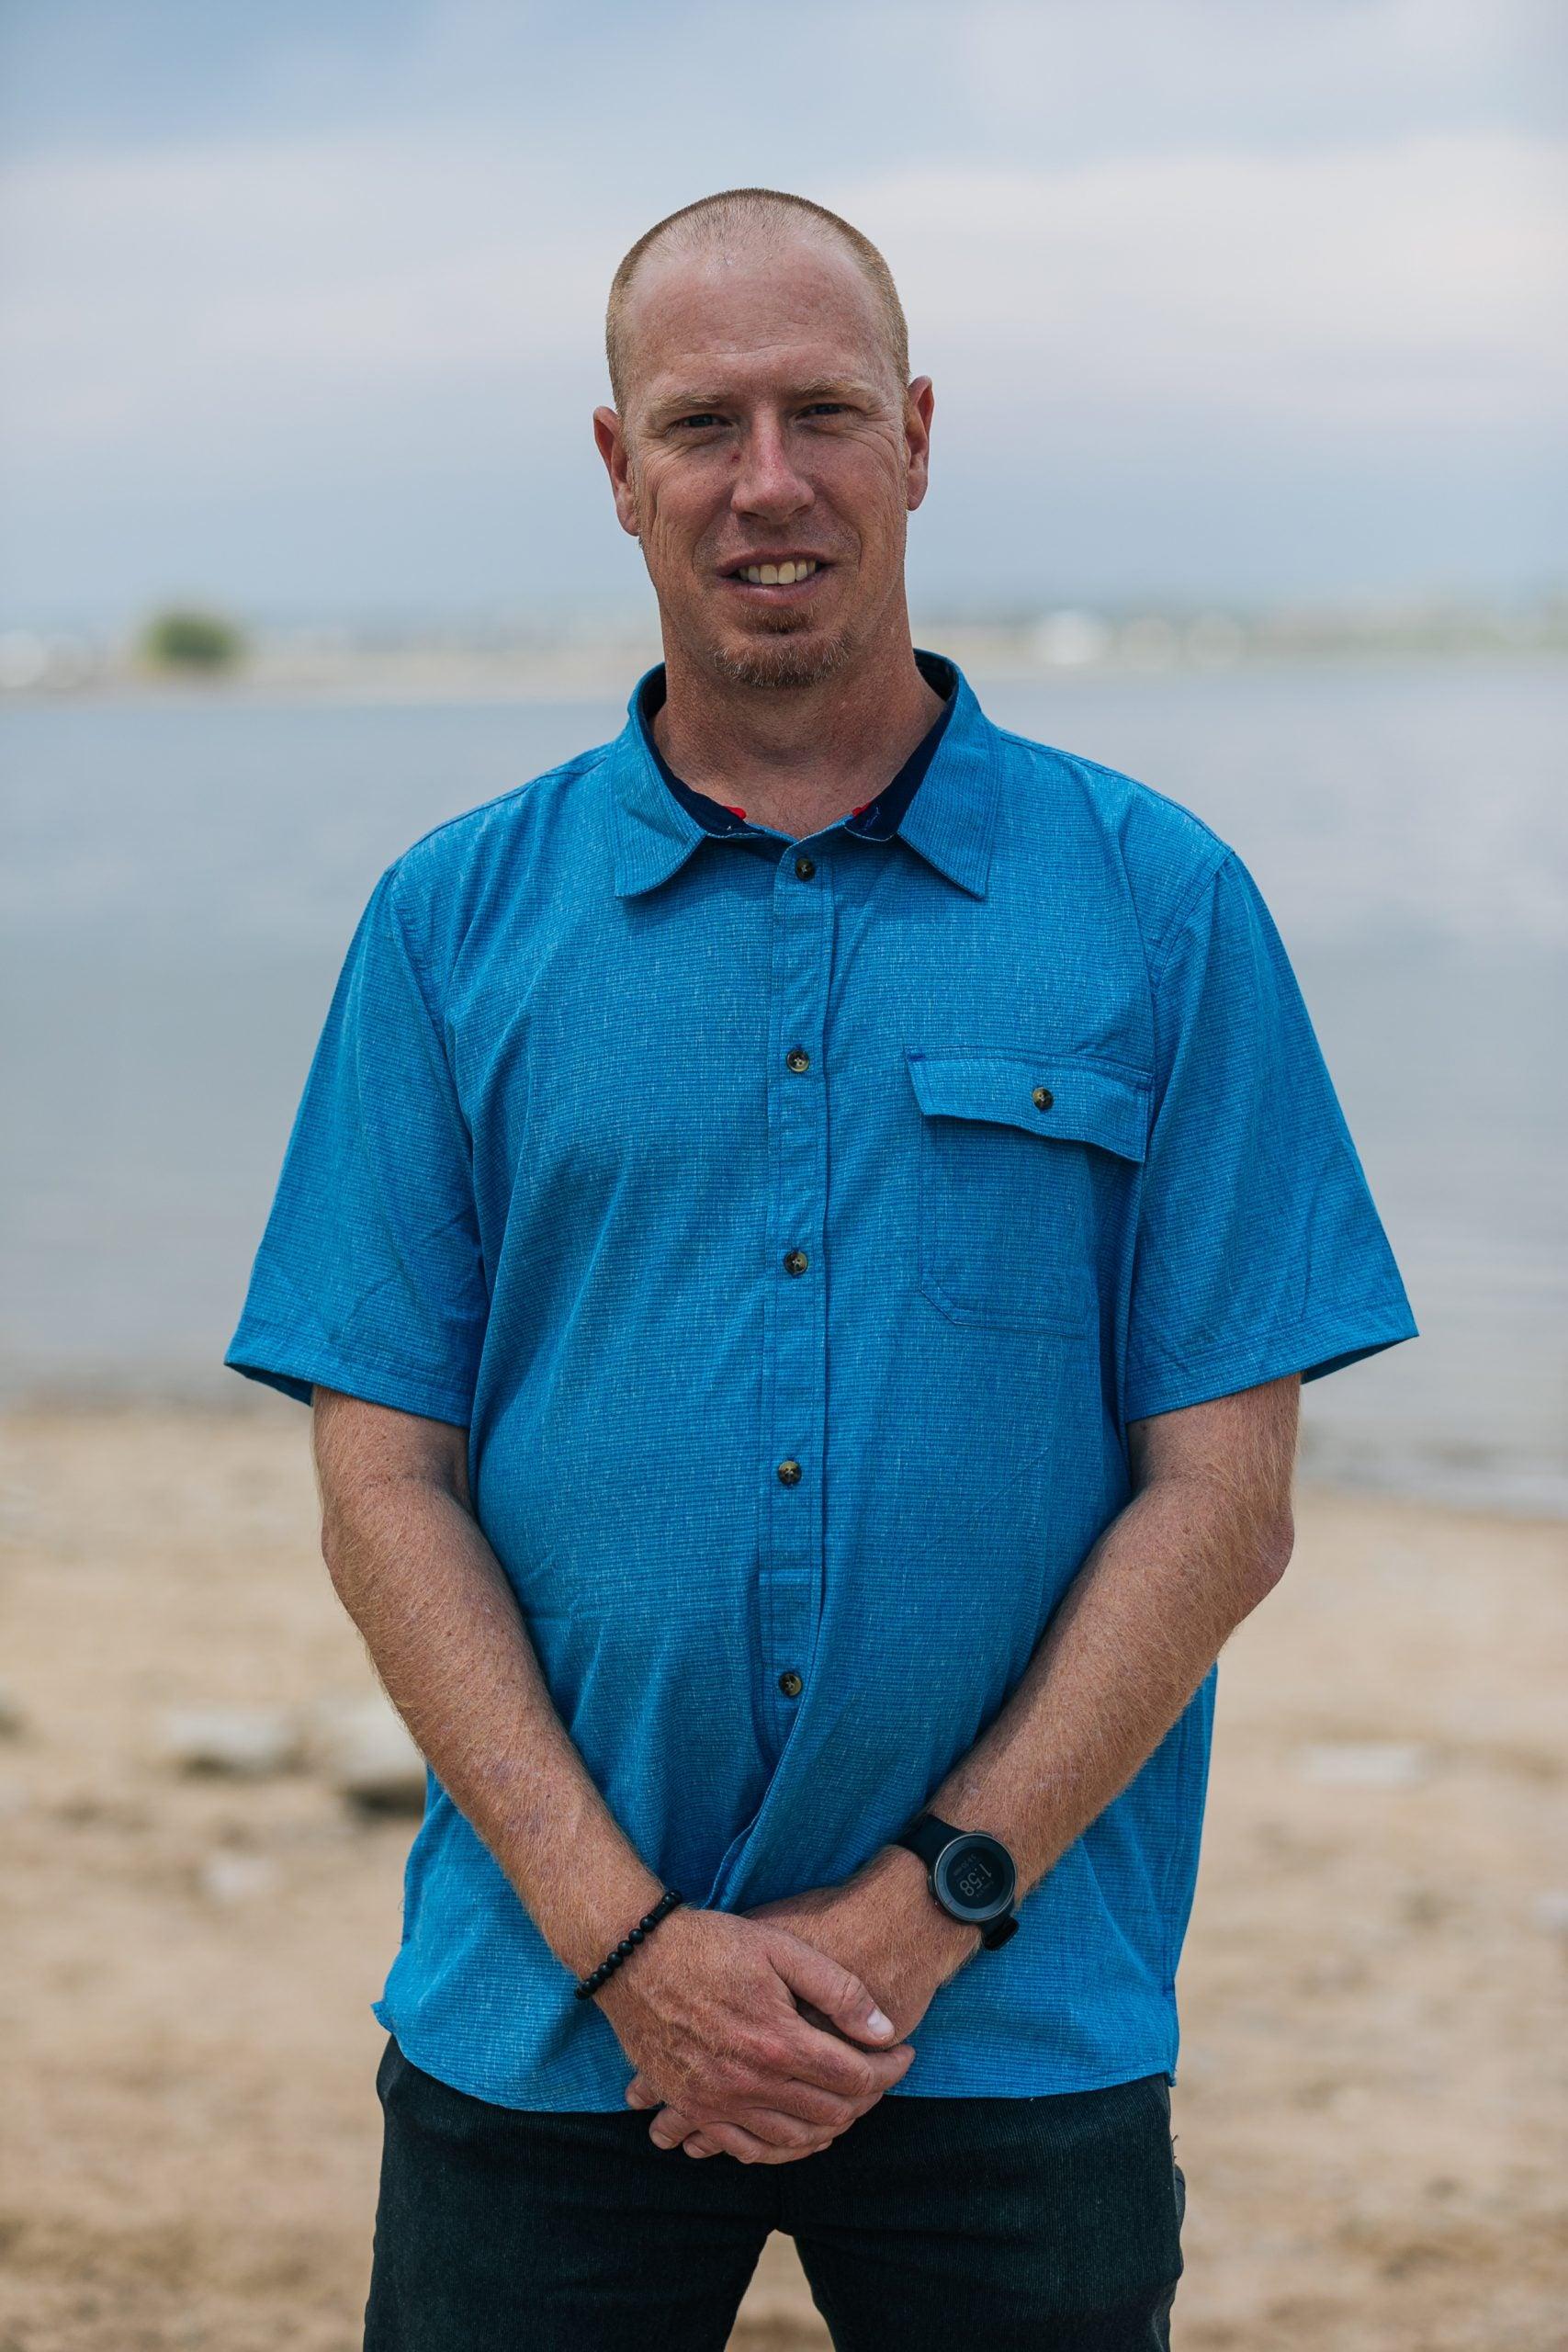 Jim Vance, Professional Triathlon Coach